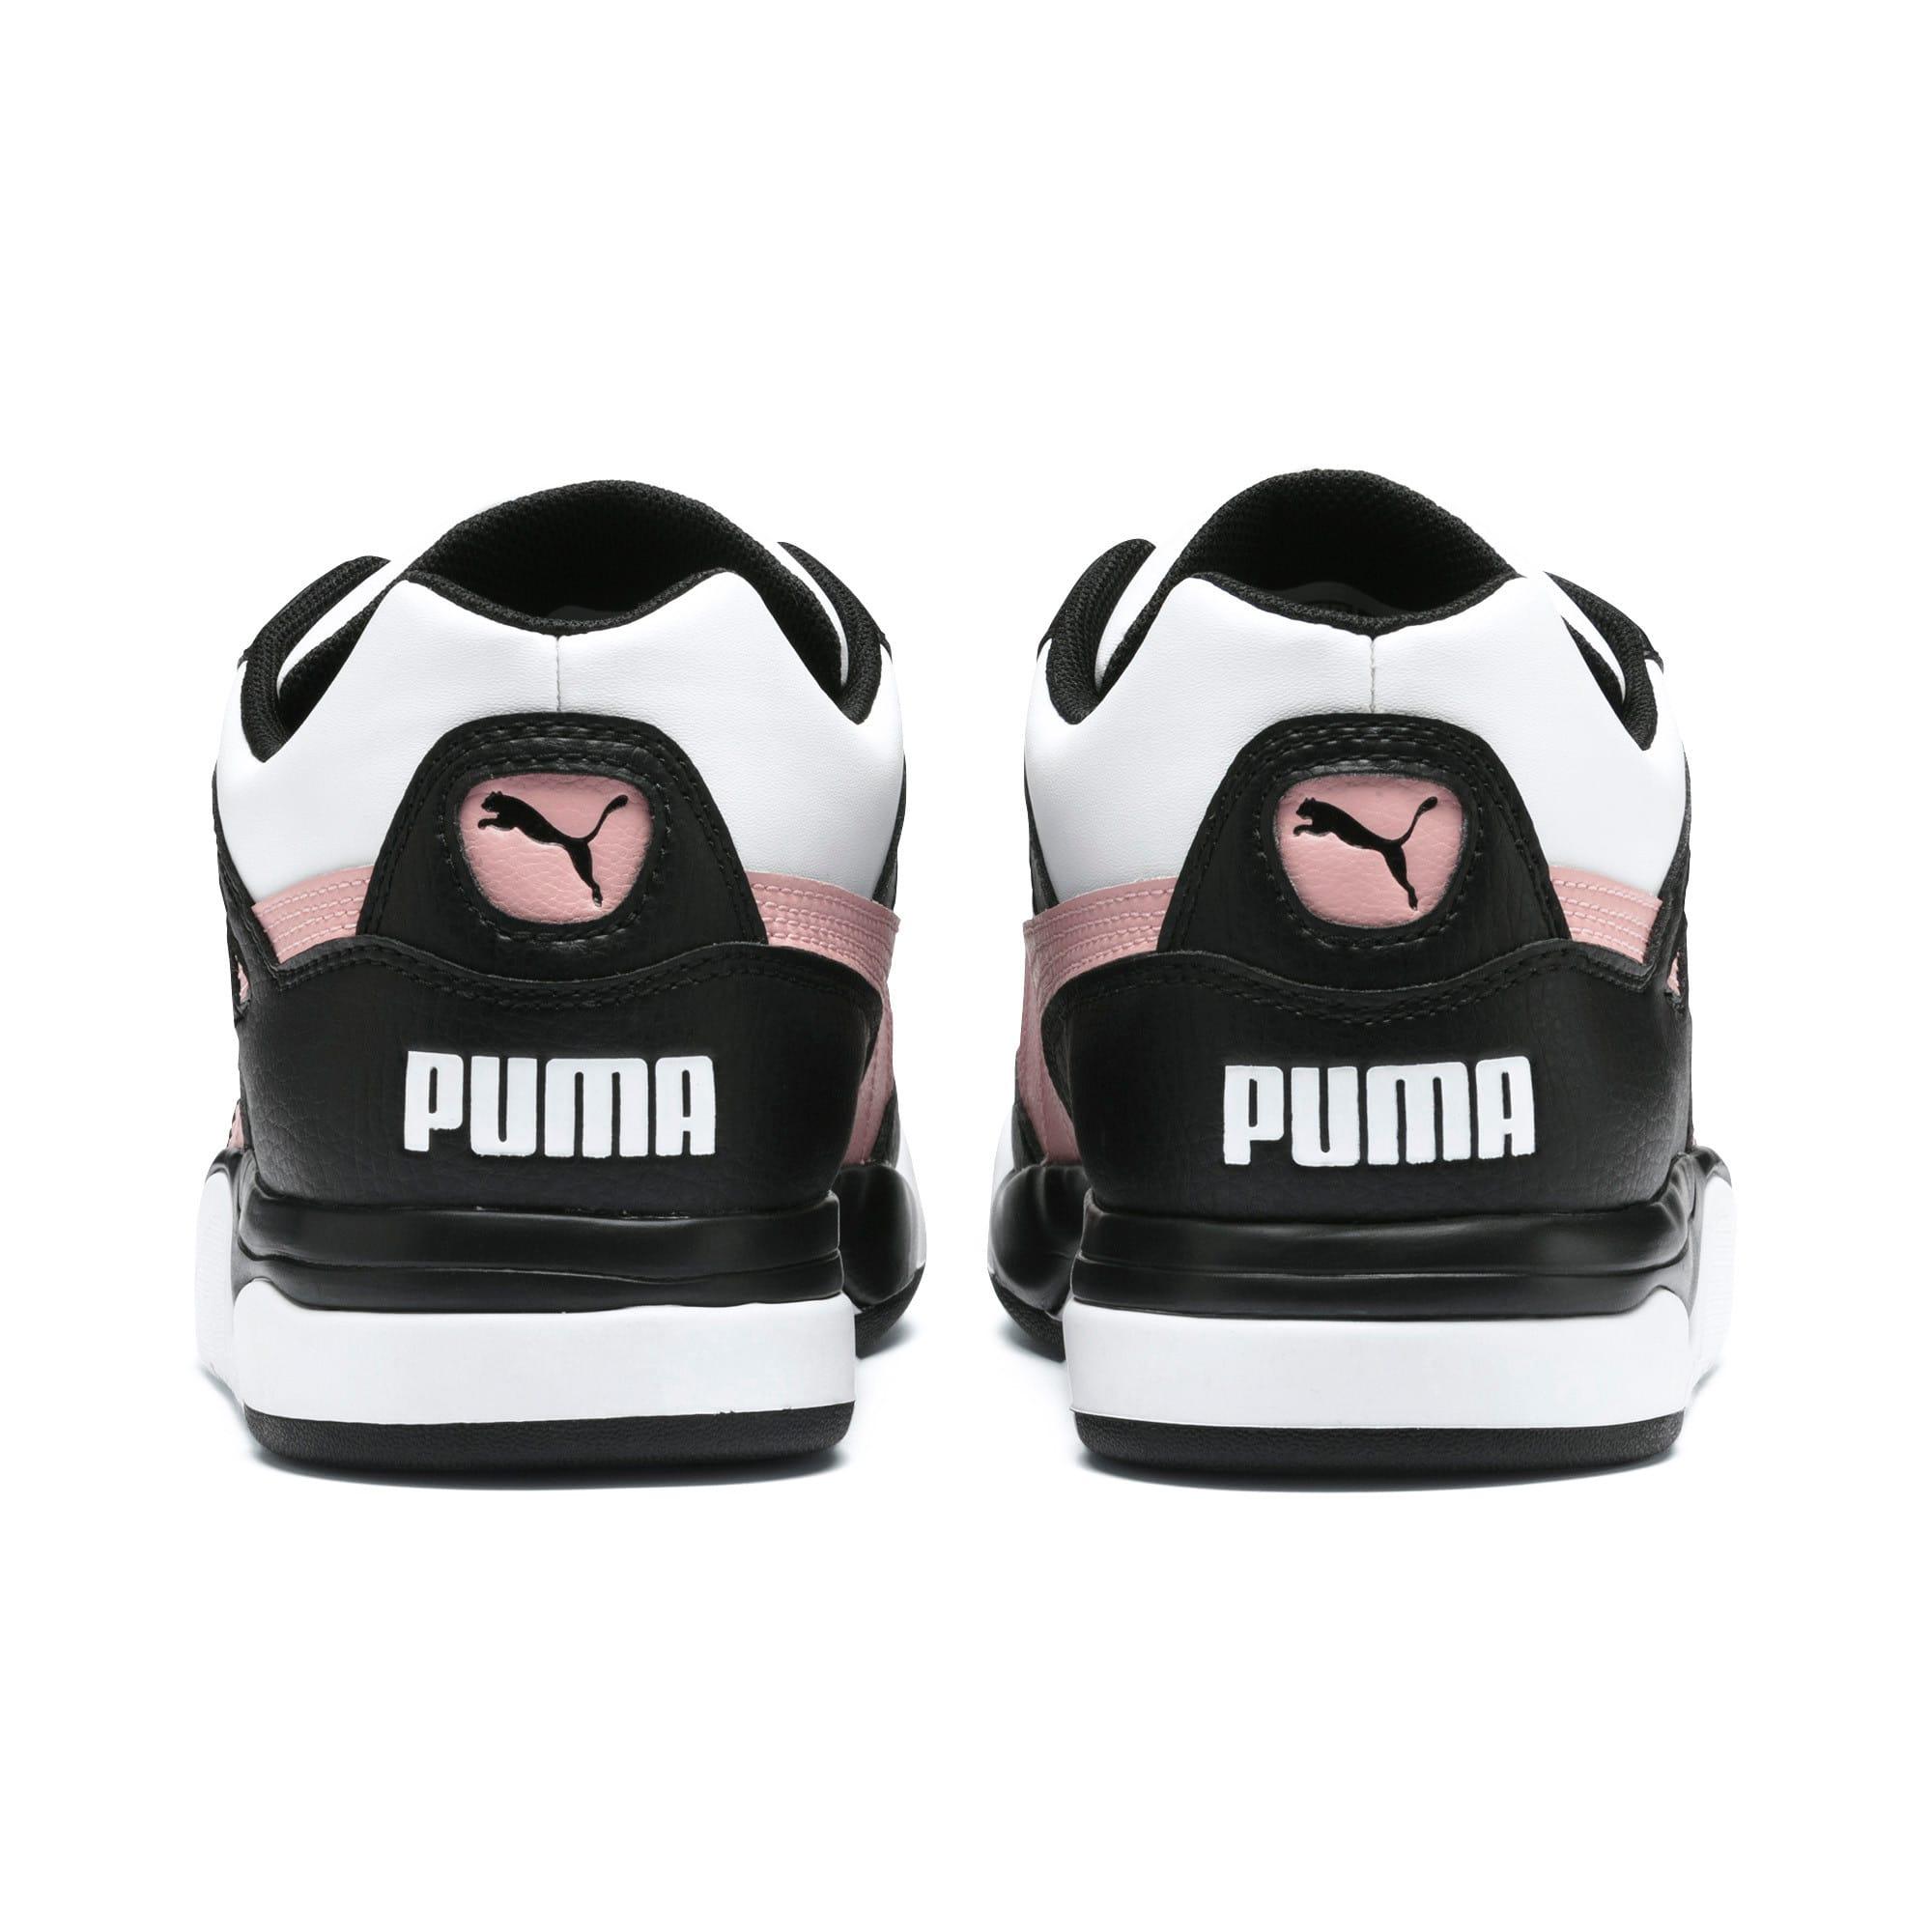 Thumbnail 4 of Palace Guard Colorblock Women's Sneakers, Puma Black-Puma White, medium